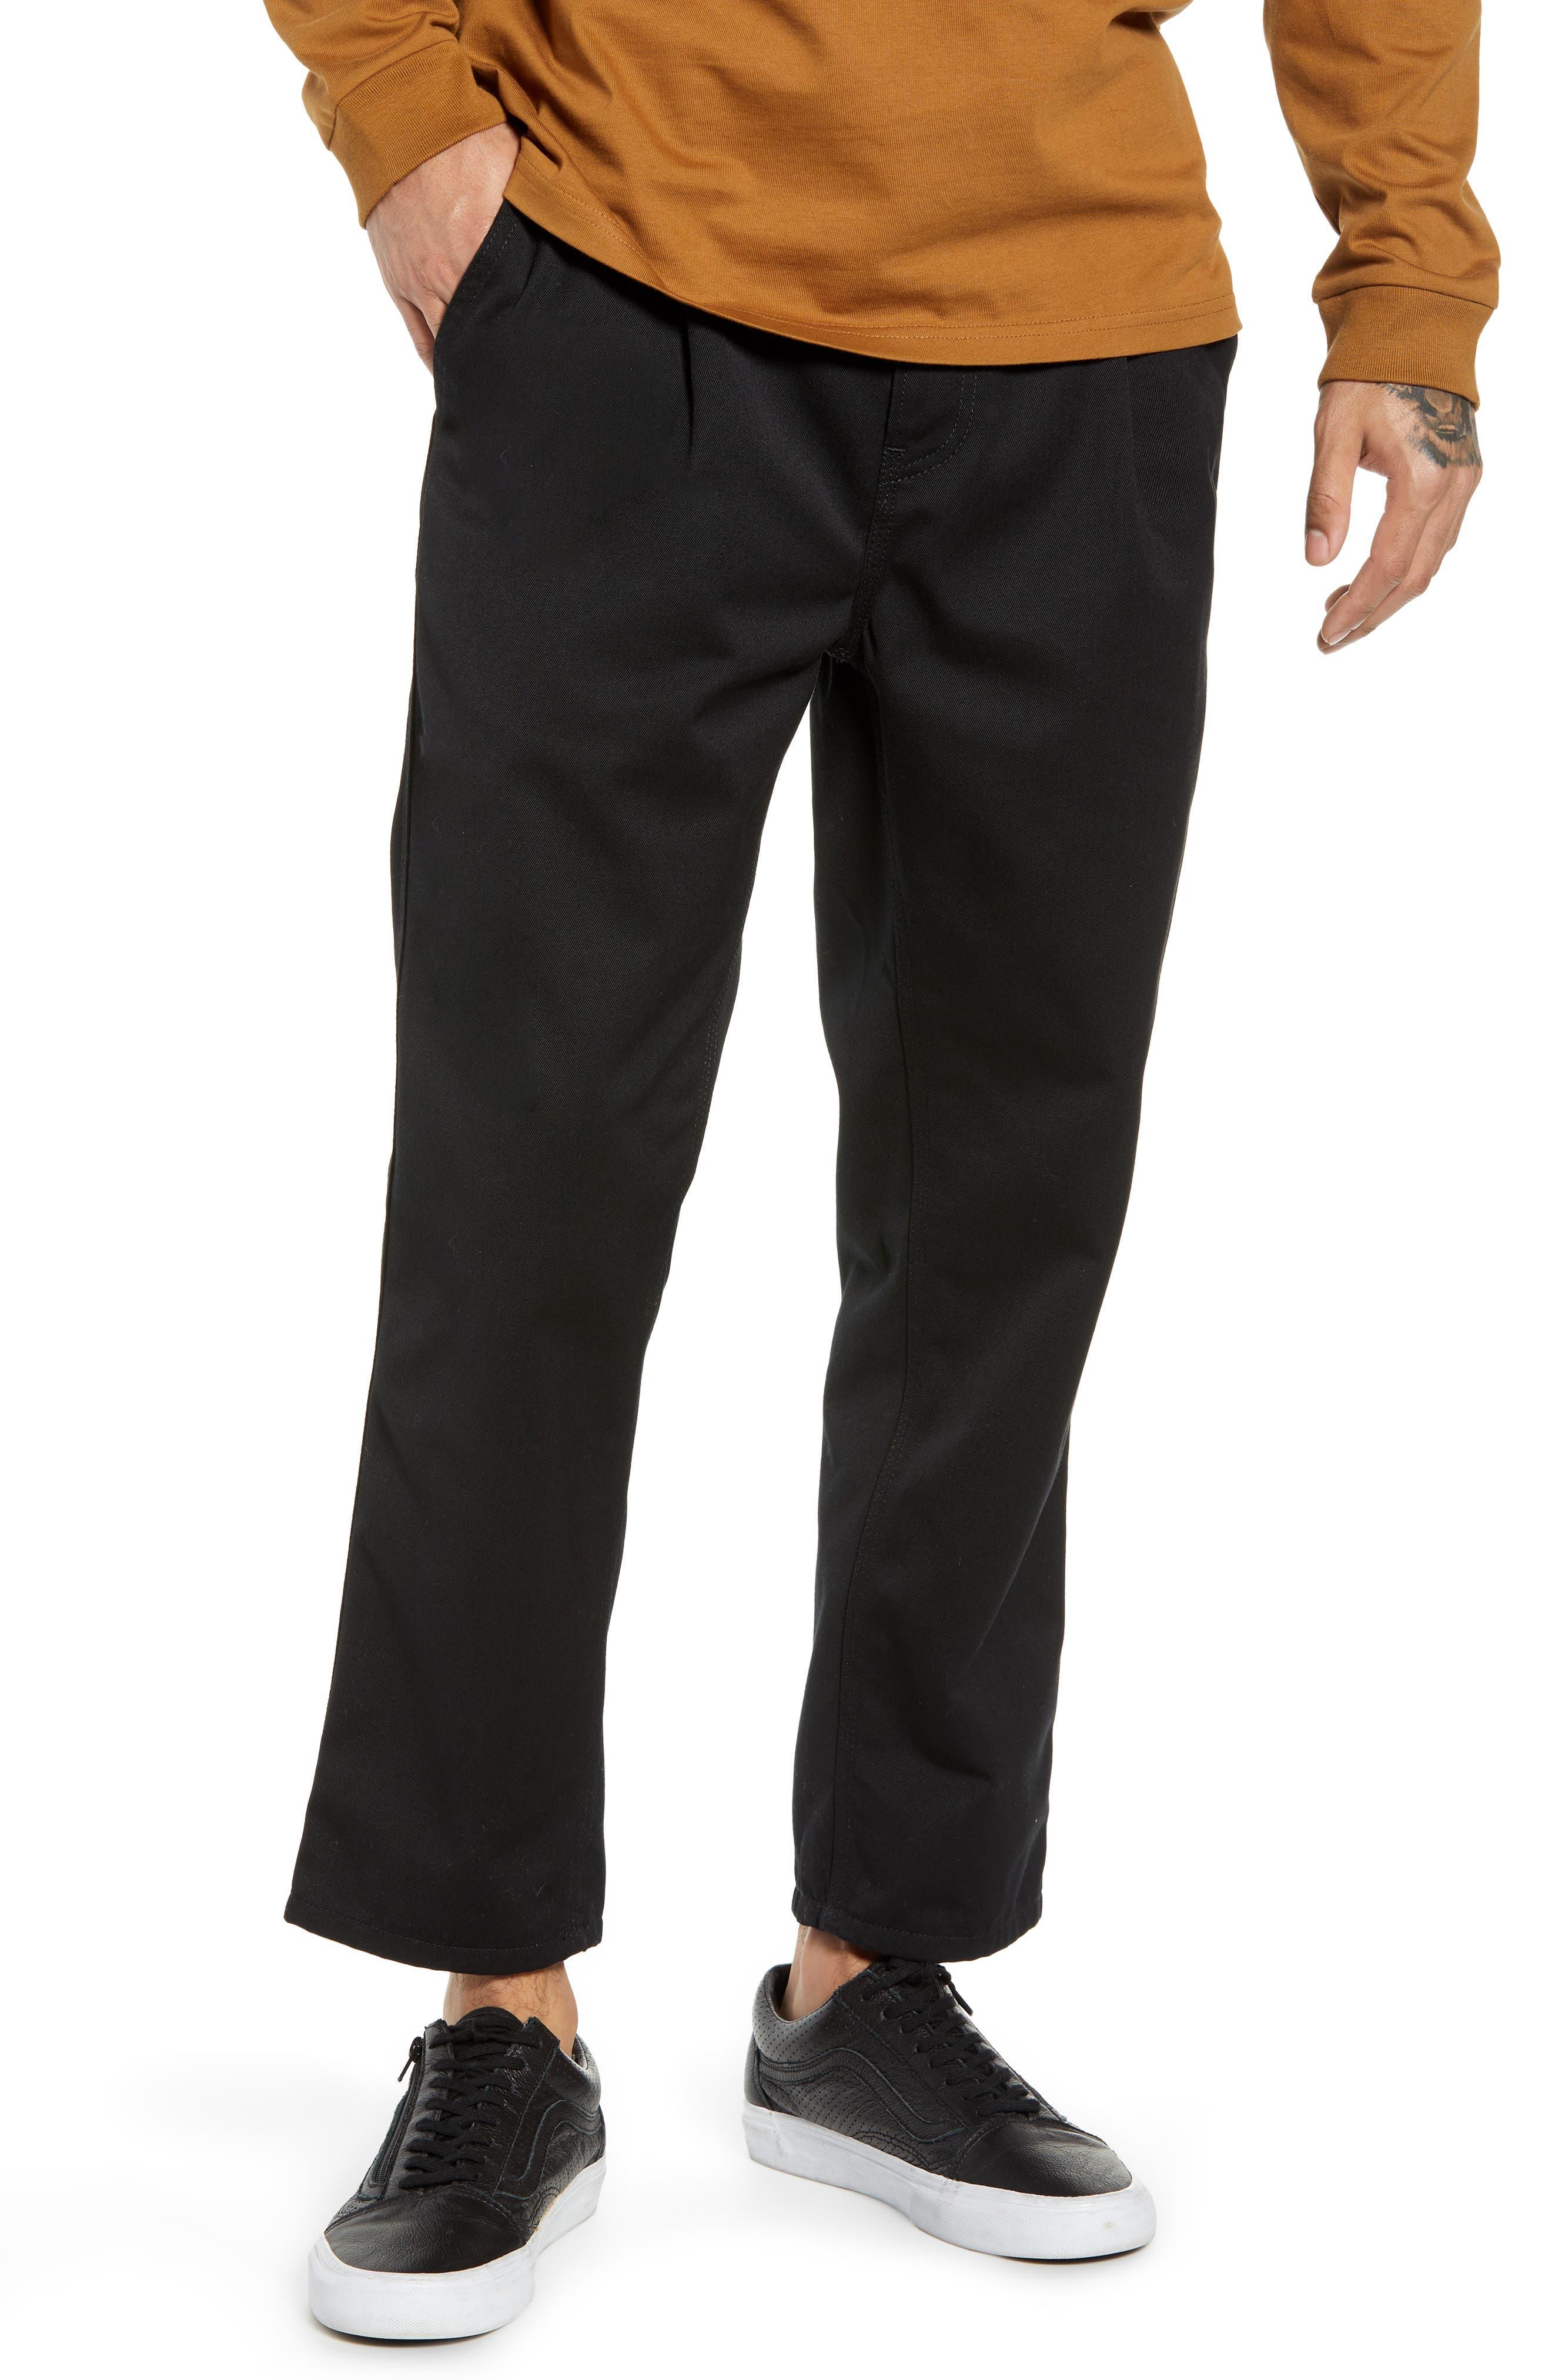 CARHARTT WORK IN PROGRESS Abbott Pants, Main, color, BLACK